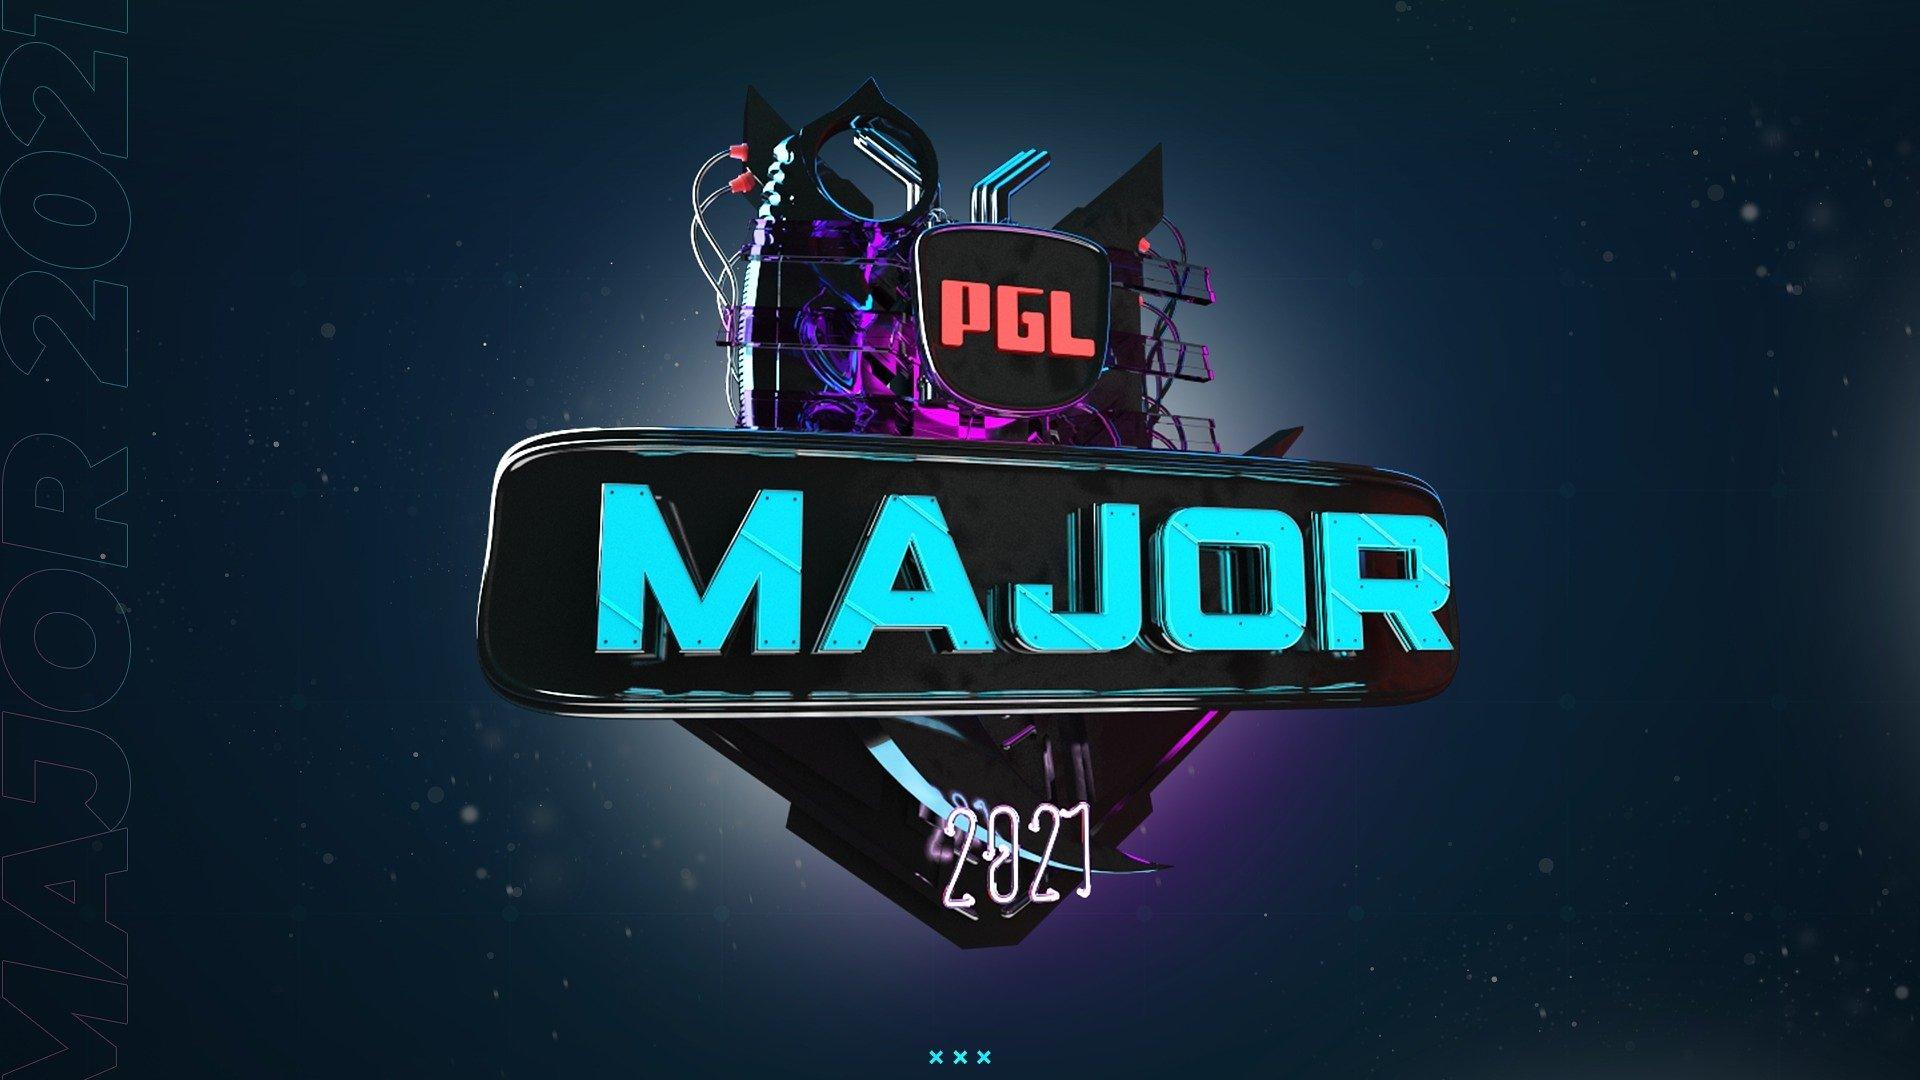 Update on PGL CS:GO MAJOR 2021